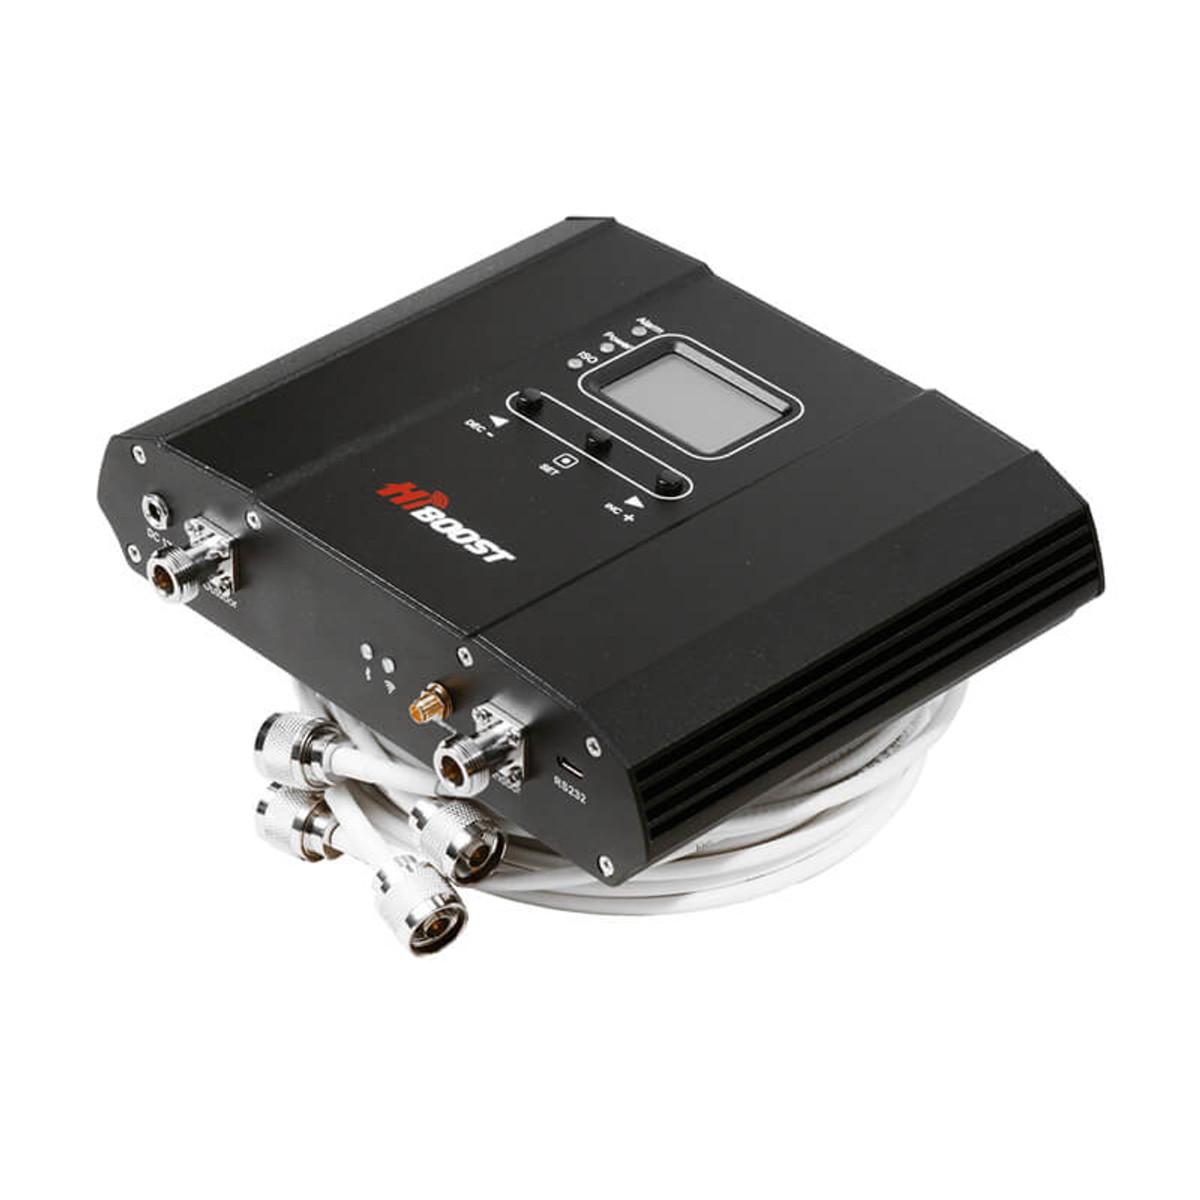 HiBoost Home 10K Smart Link Signal Booster Amplifier